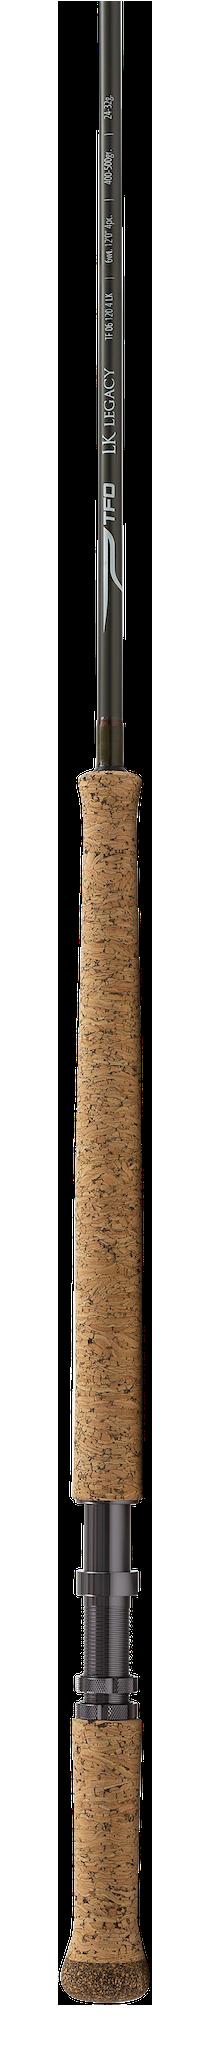 TFO TFO LK Legacy Spey Rod